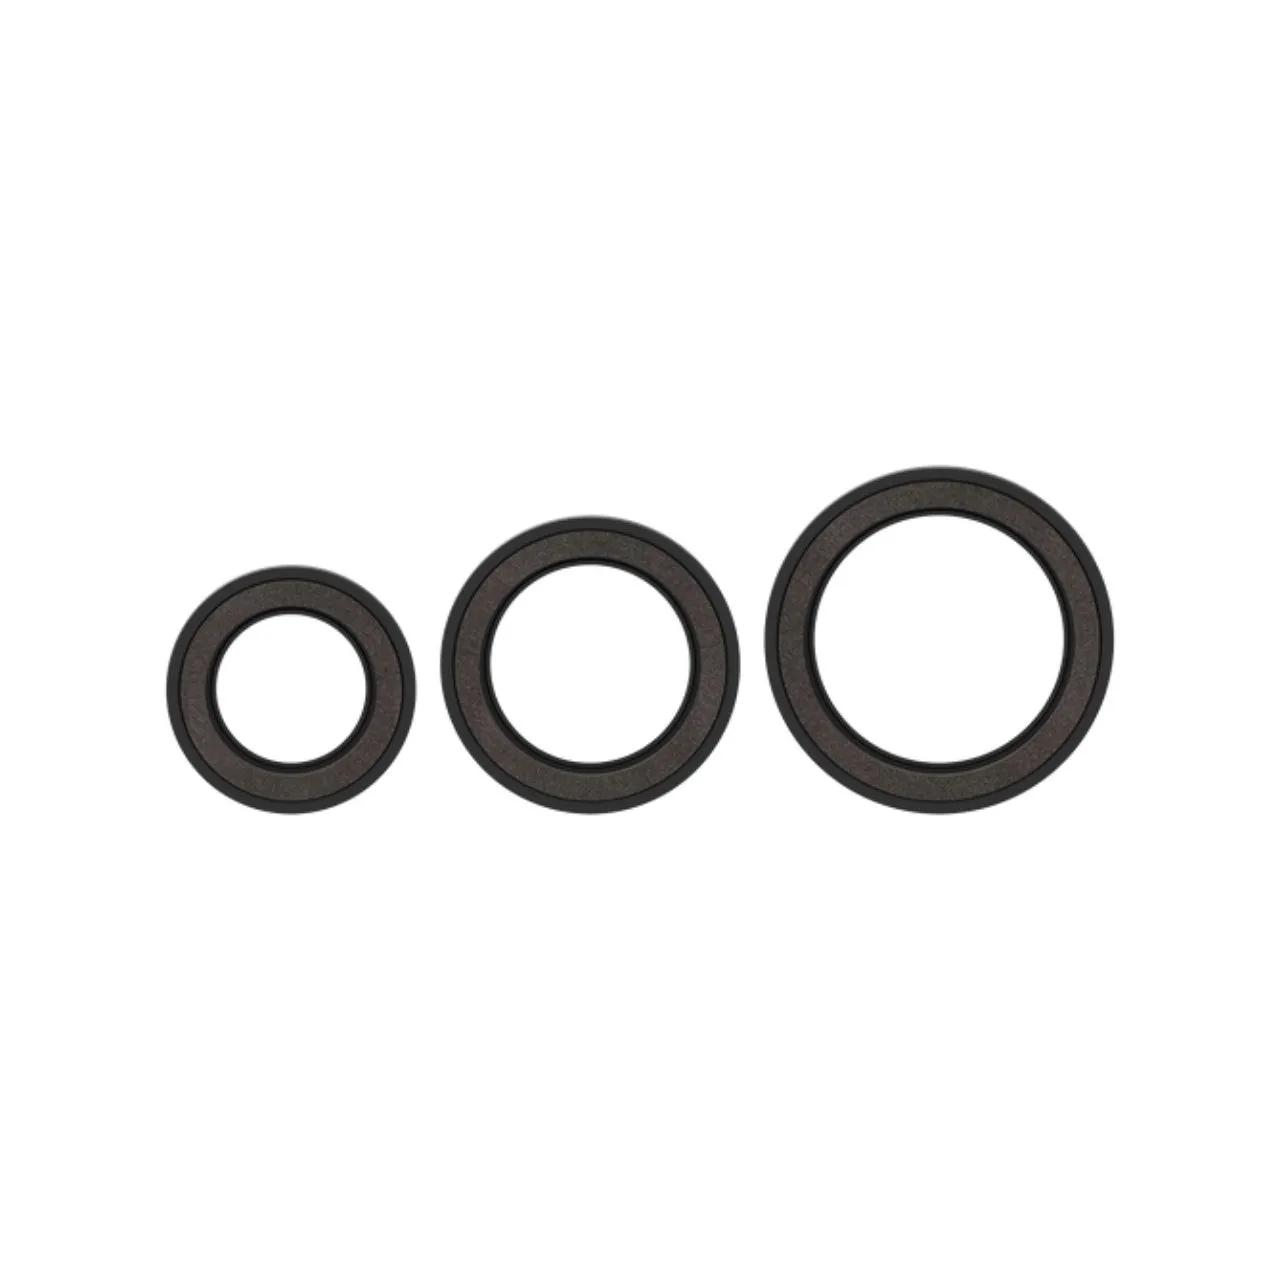 Anel Abafador 10 Pol Muffl Control Ring Mf-1010-00 Remo